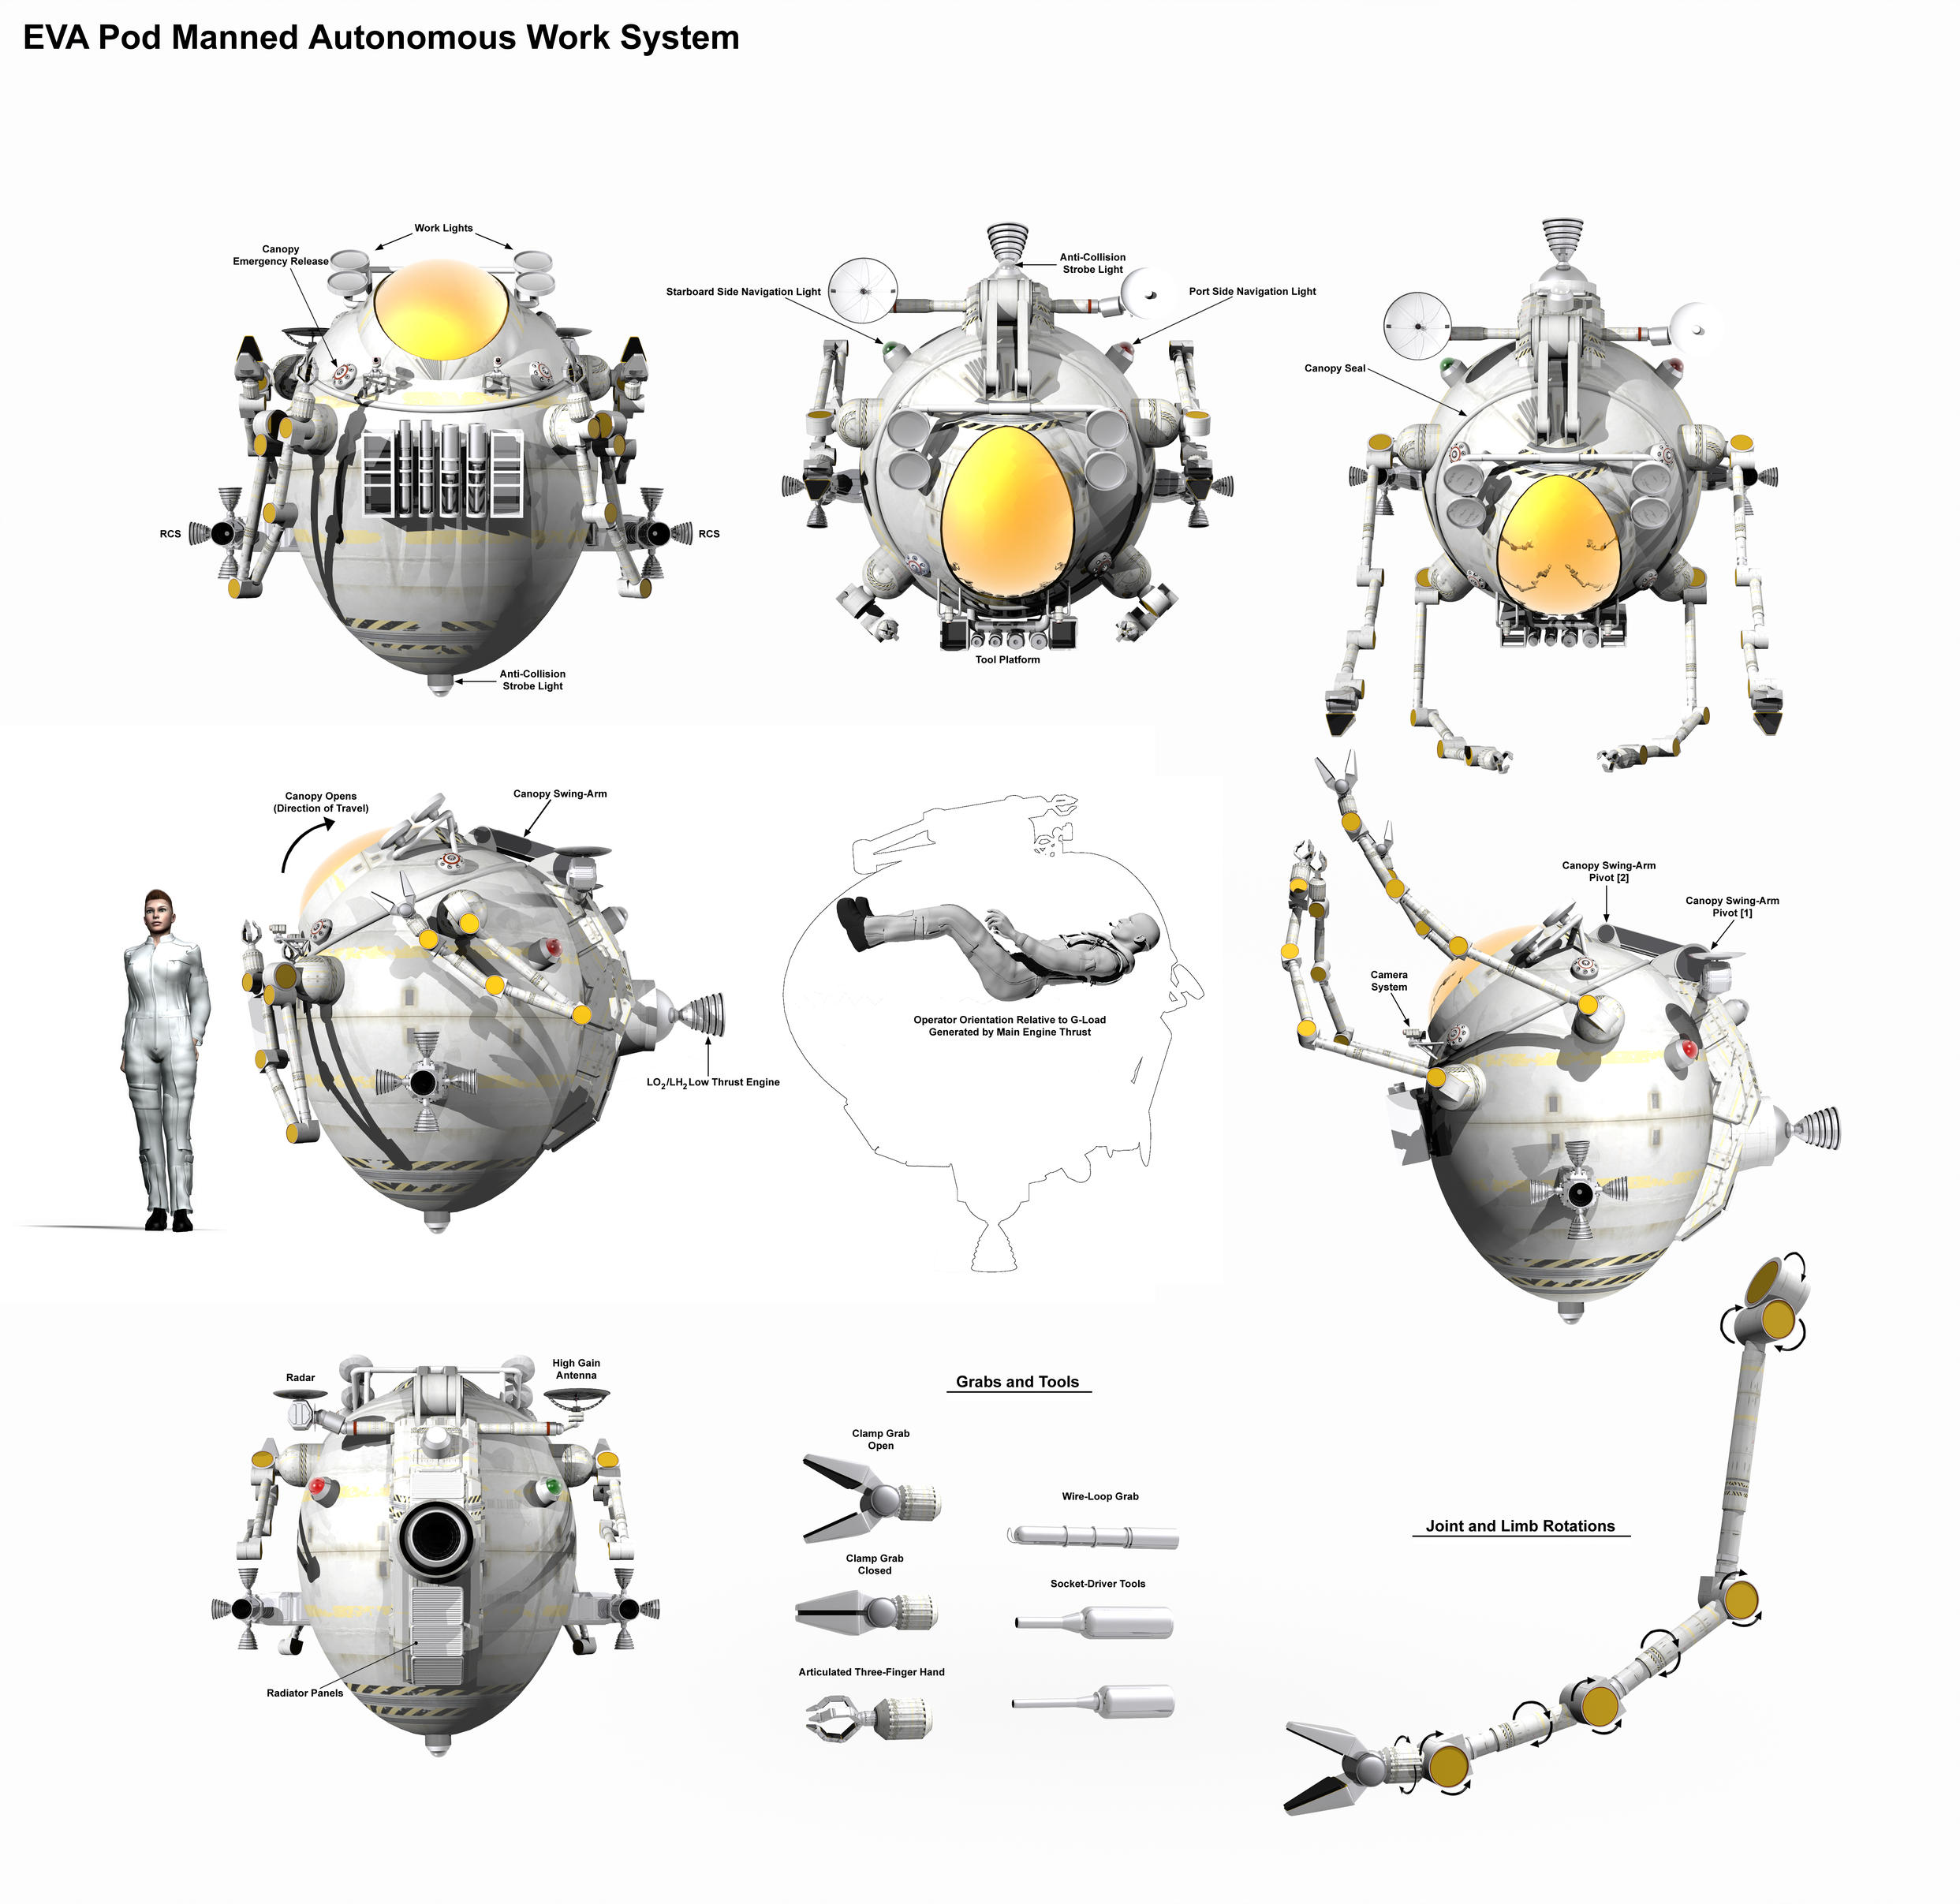 Eva Pod Diagram By William Black On Deviantart